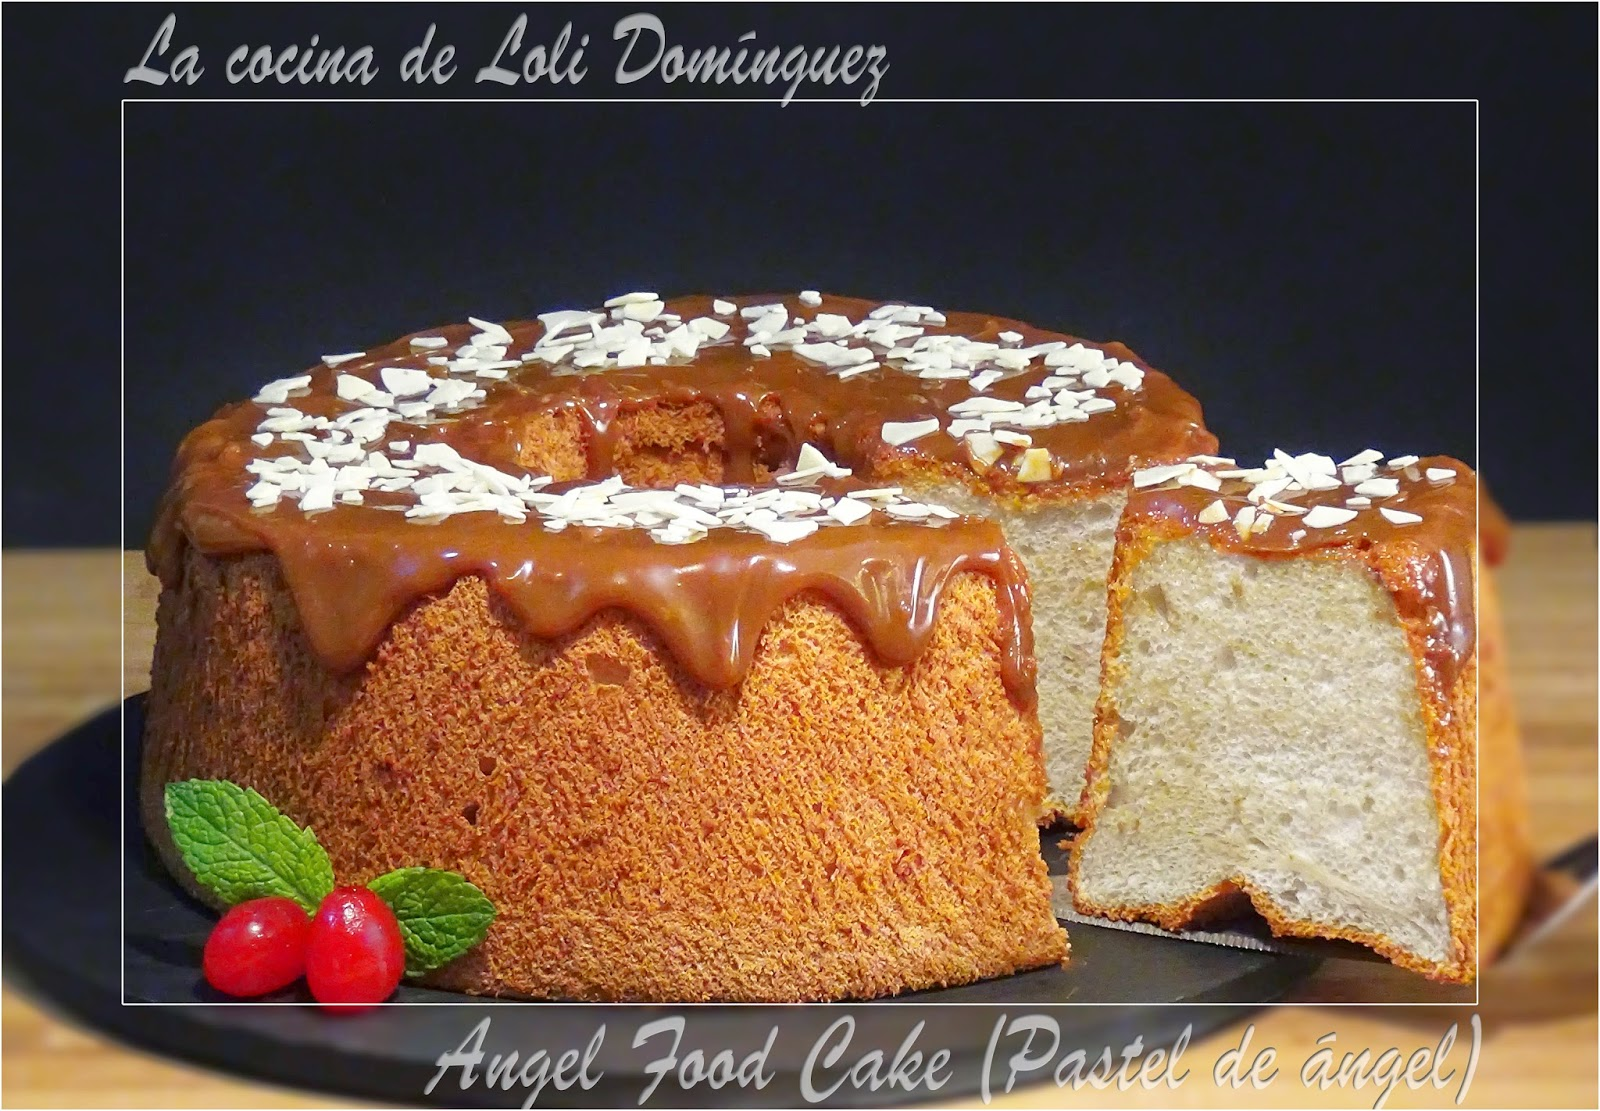 la cocina de loli dom nguez angel food cake pastel de ngel On la cocina de loli